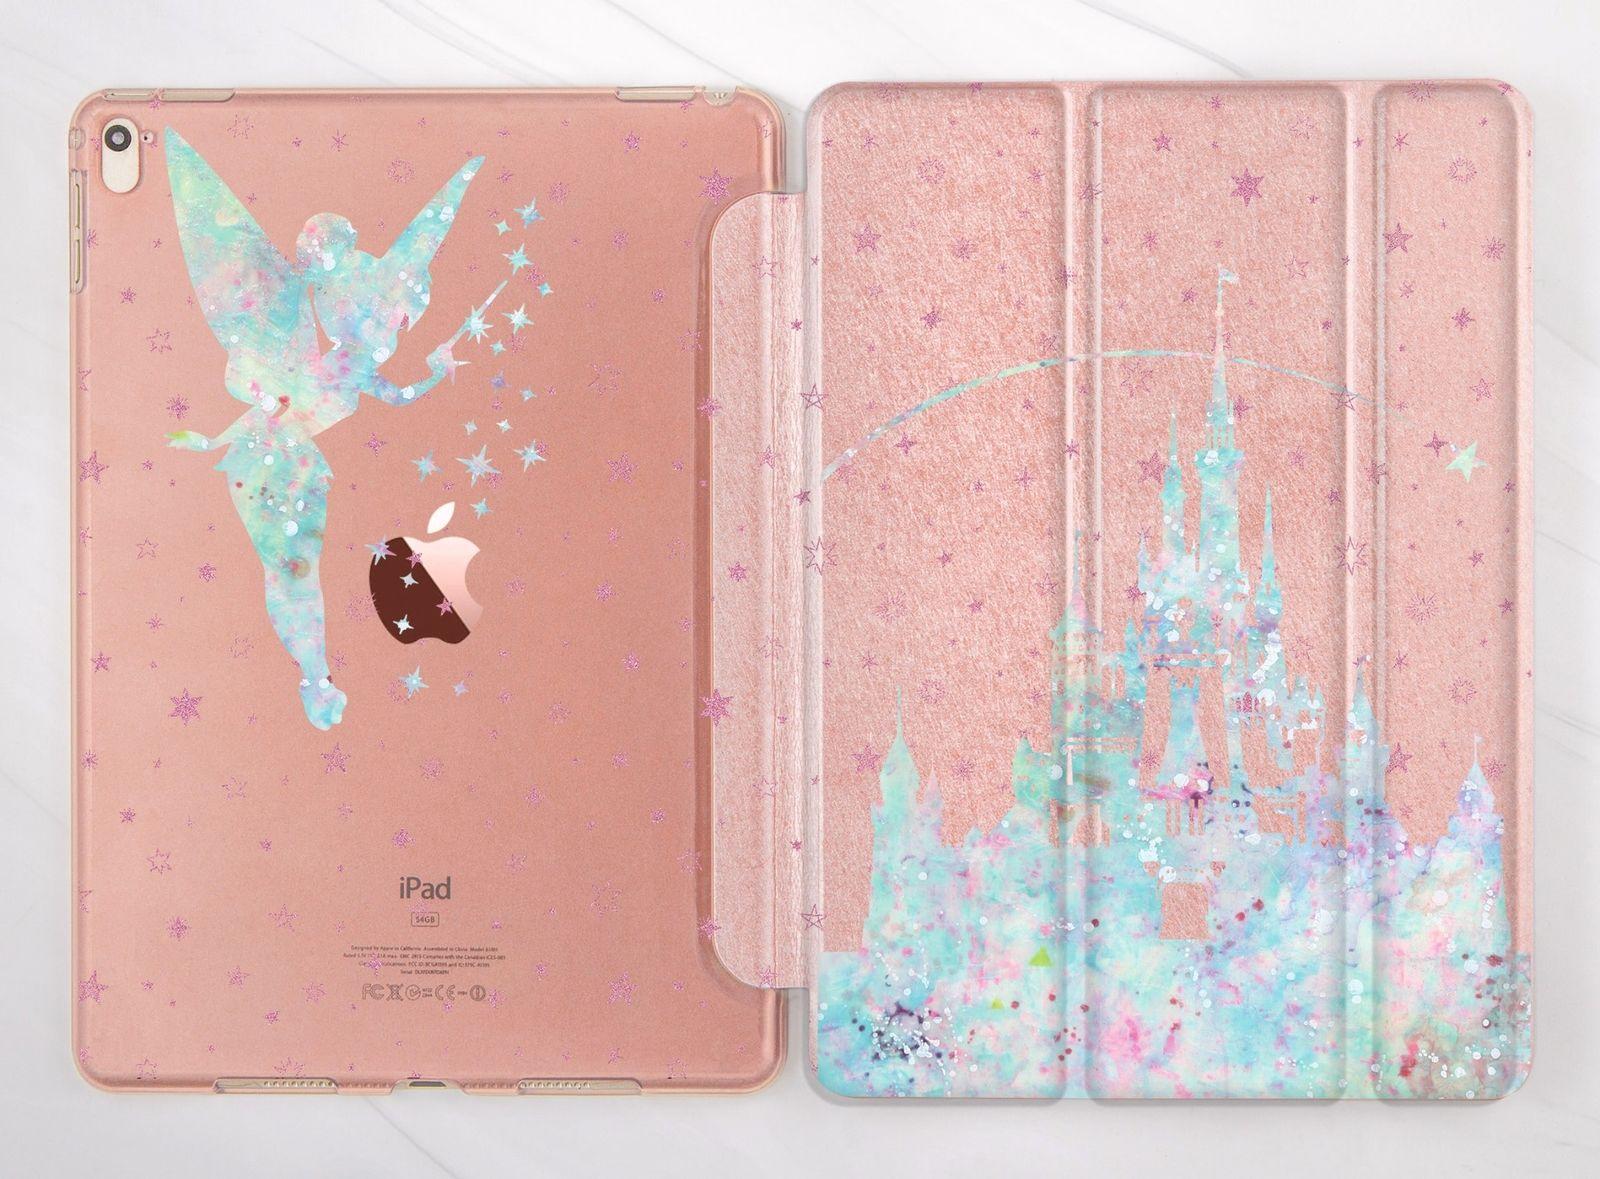 Blue Marble iPad 2018 case iPad Pro 10.5 Marble case iPad 9.7 case iPad Air 2019 case iPad Mini 4 case iPad 9.7 2017 case iPad Smart cover